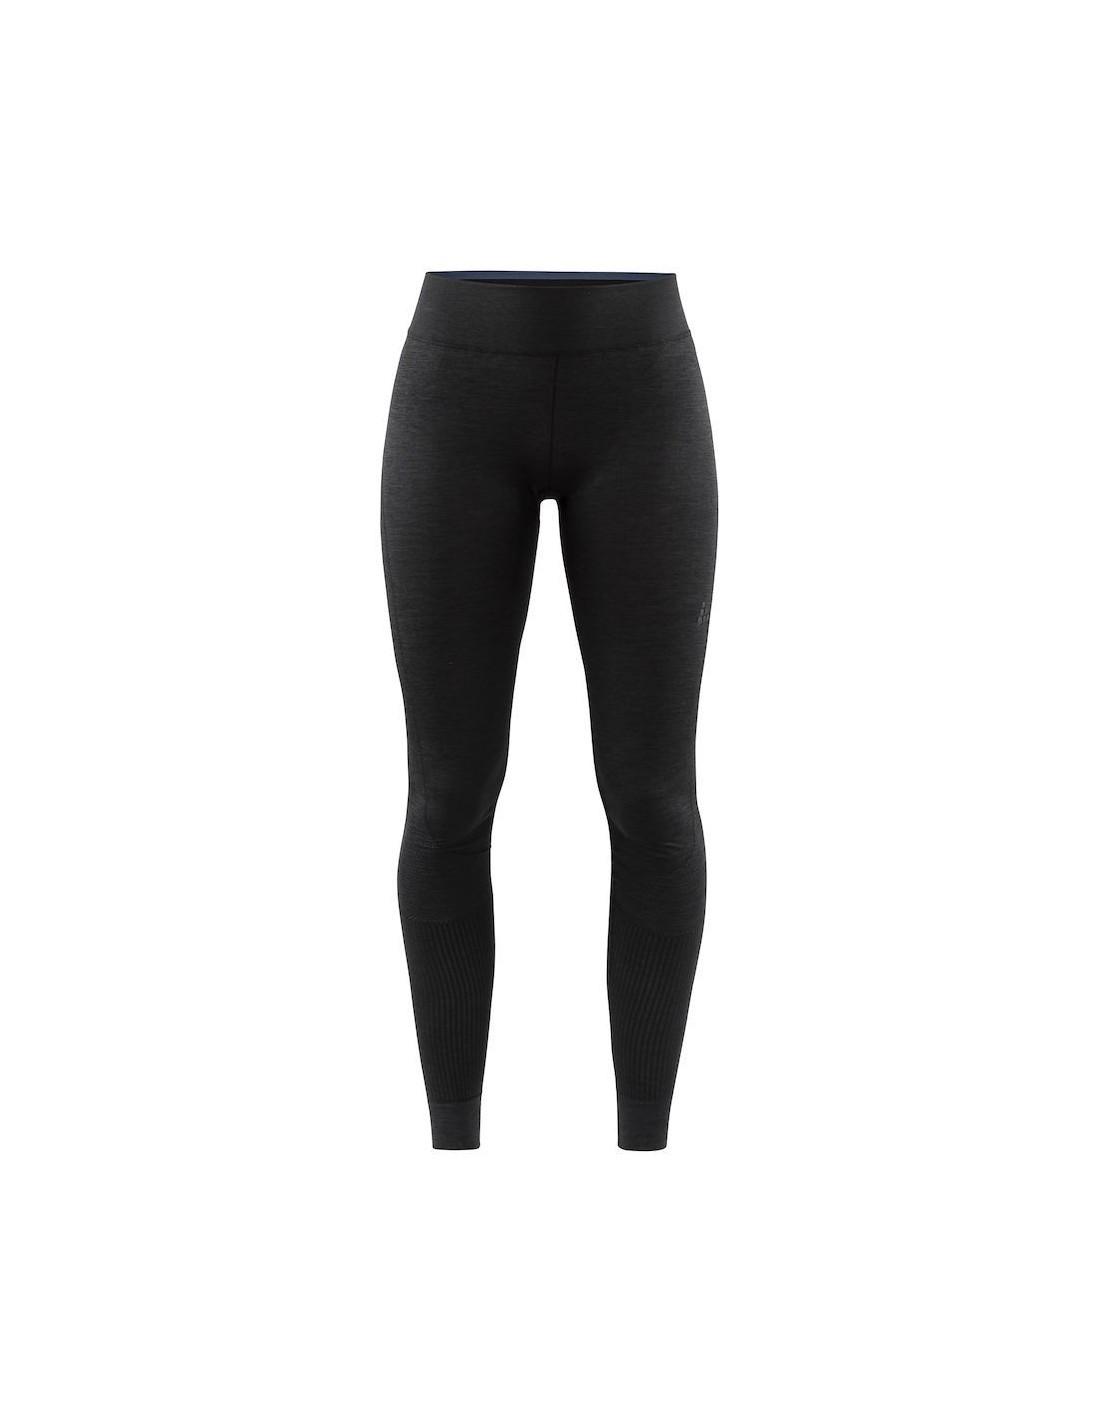 e49ab046ea40aa Kalesony damskie Craft Fuseknit Comfort Pants W Czarne - STSklep